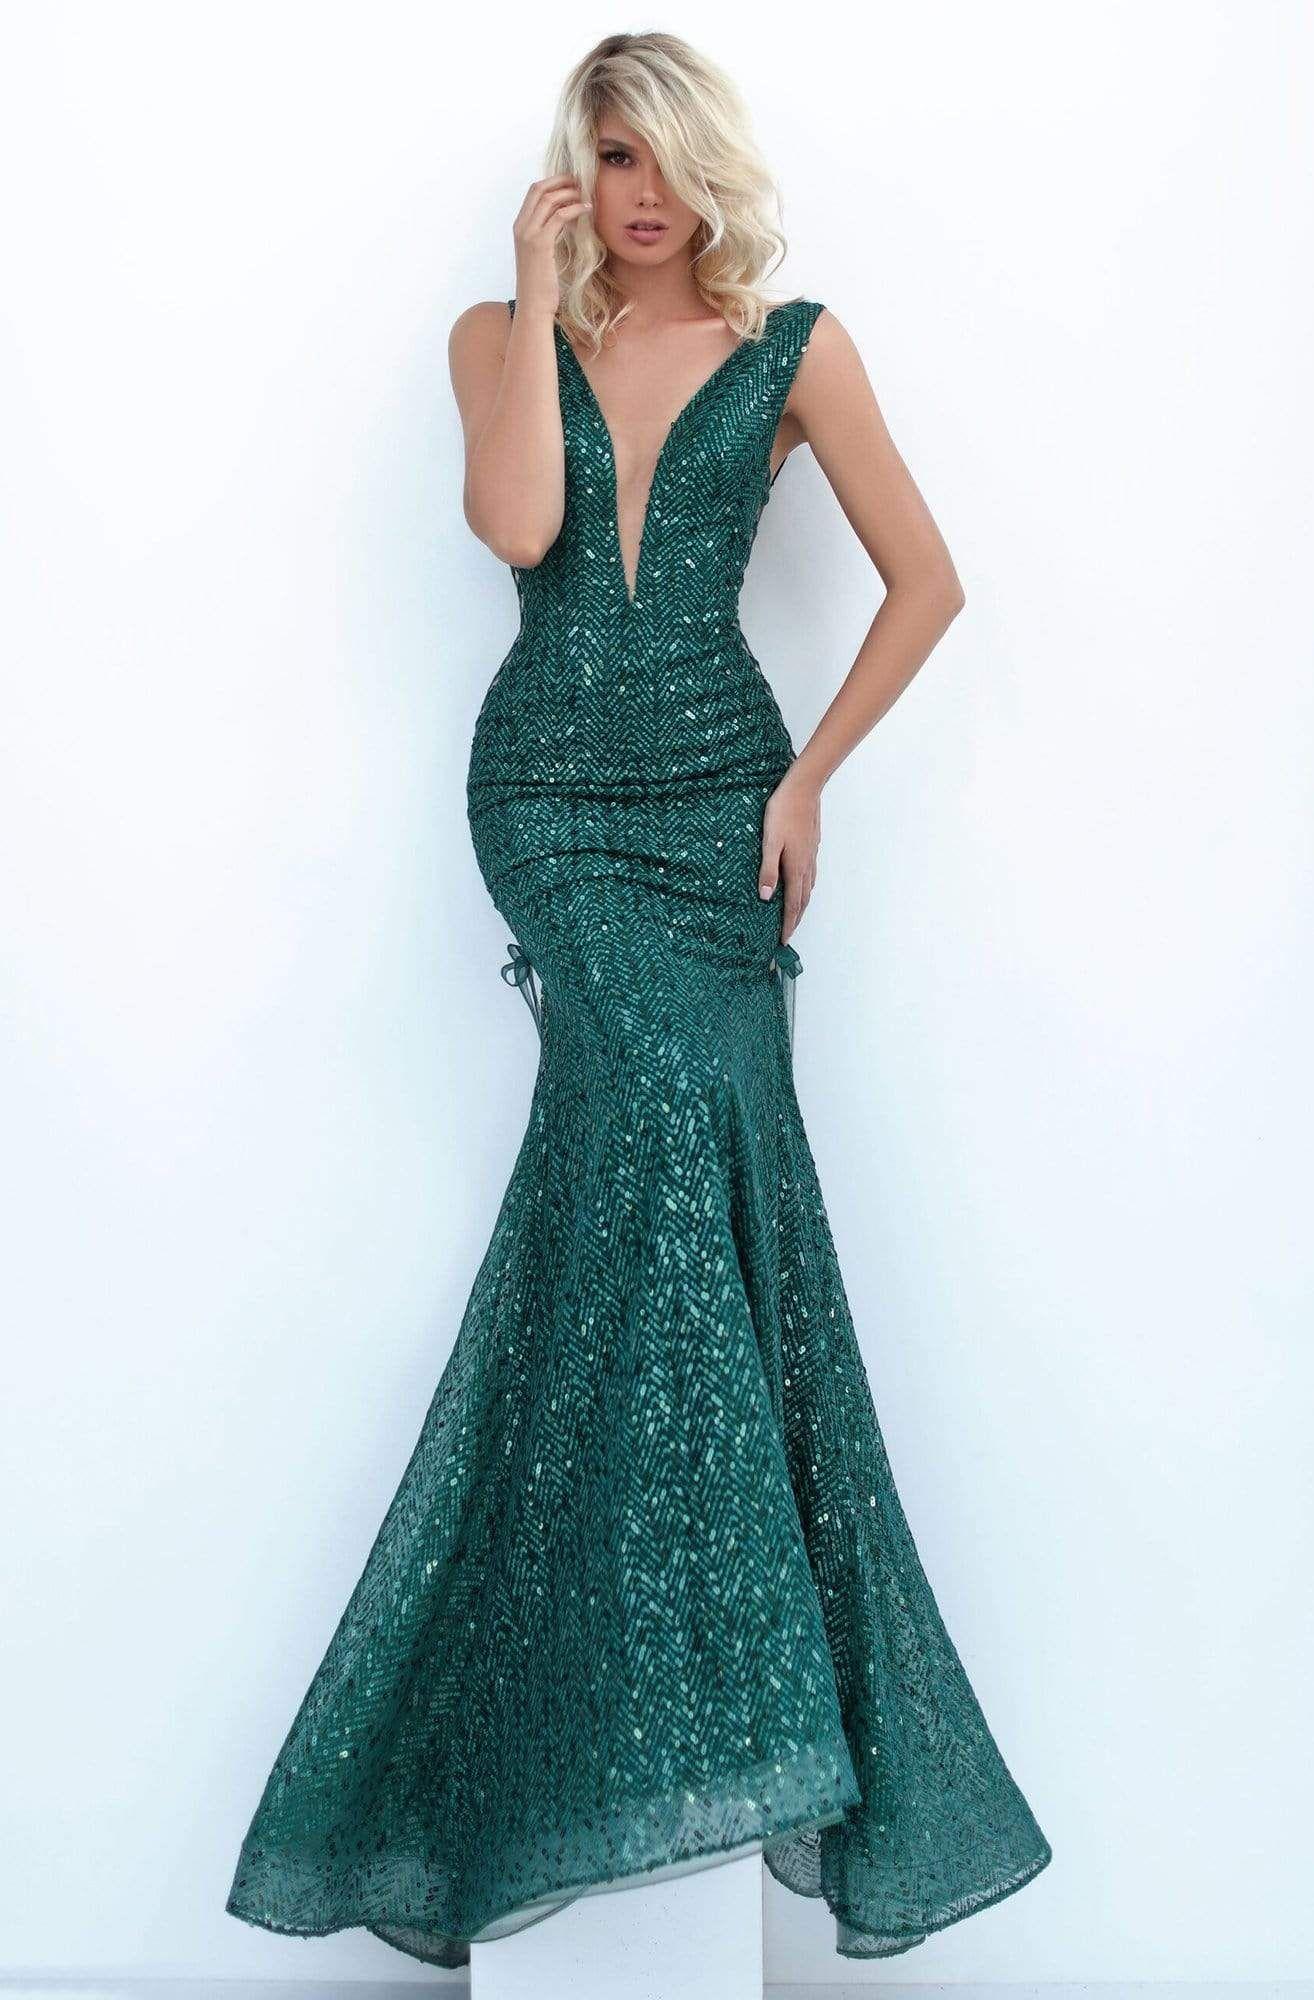 Hunter Green Mermaid Evening Dresses Long Off Shoulder Prom Dress Longpromdress Promdress Eveningdress Green Prom Dress Prom Dresses For Teens Prom Dresses [ 1726 x 800 Pixel ]